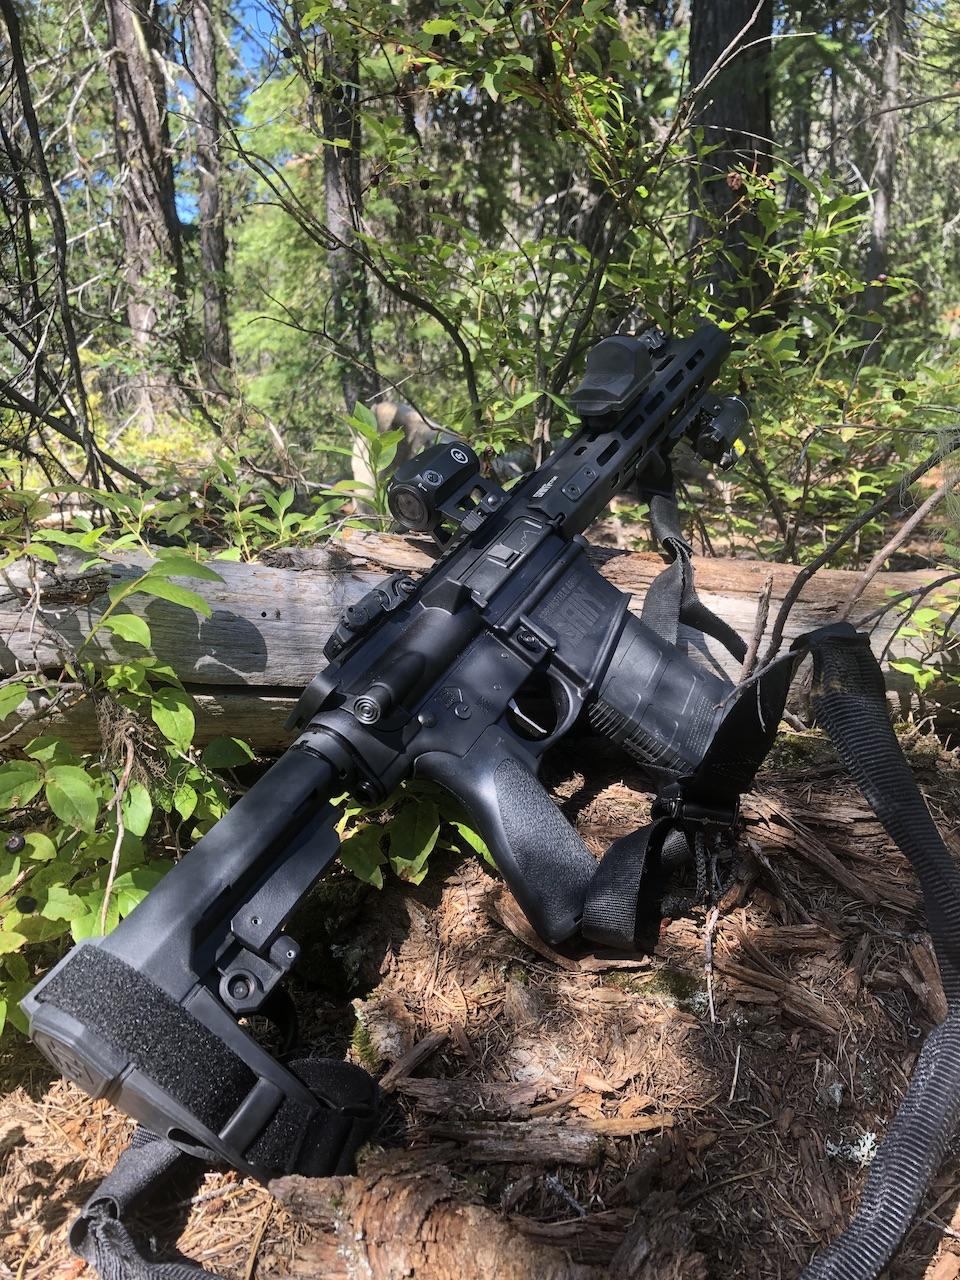 Saint Victor .308 AR-10 Pistol as a backwoods predator defense companion